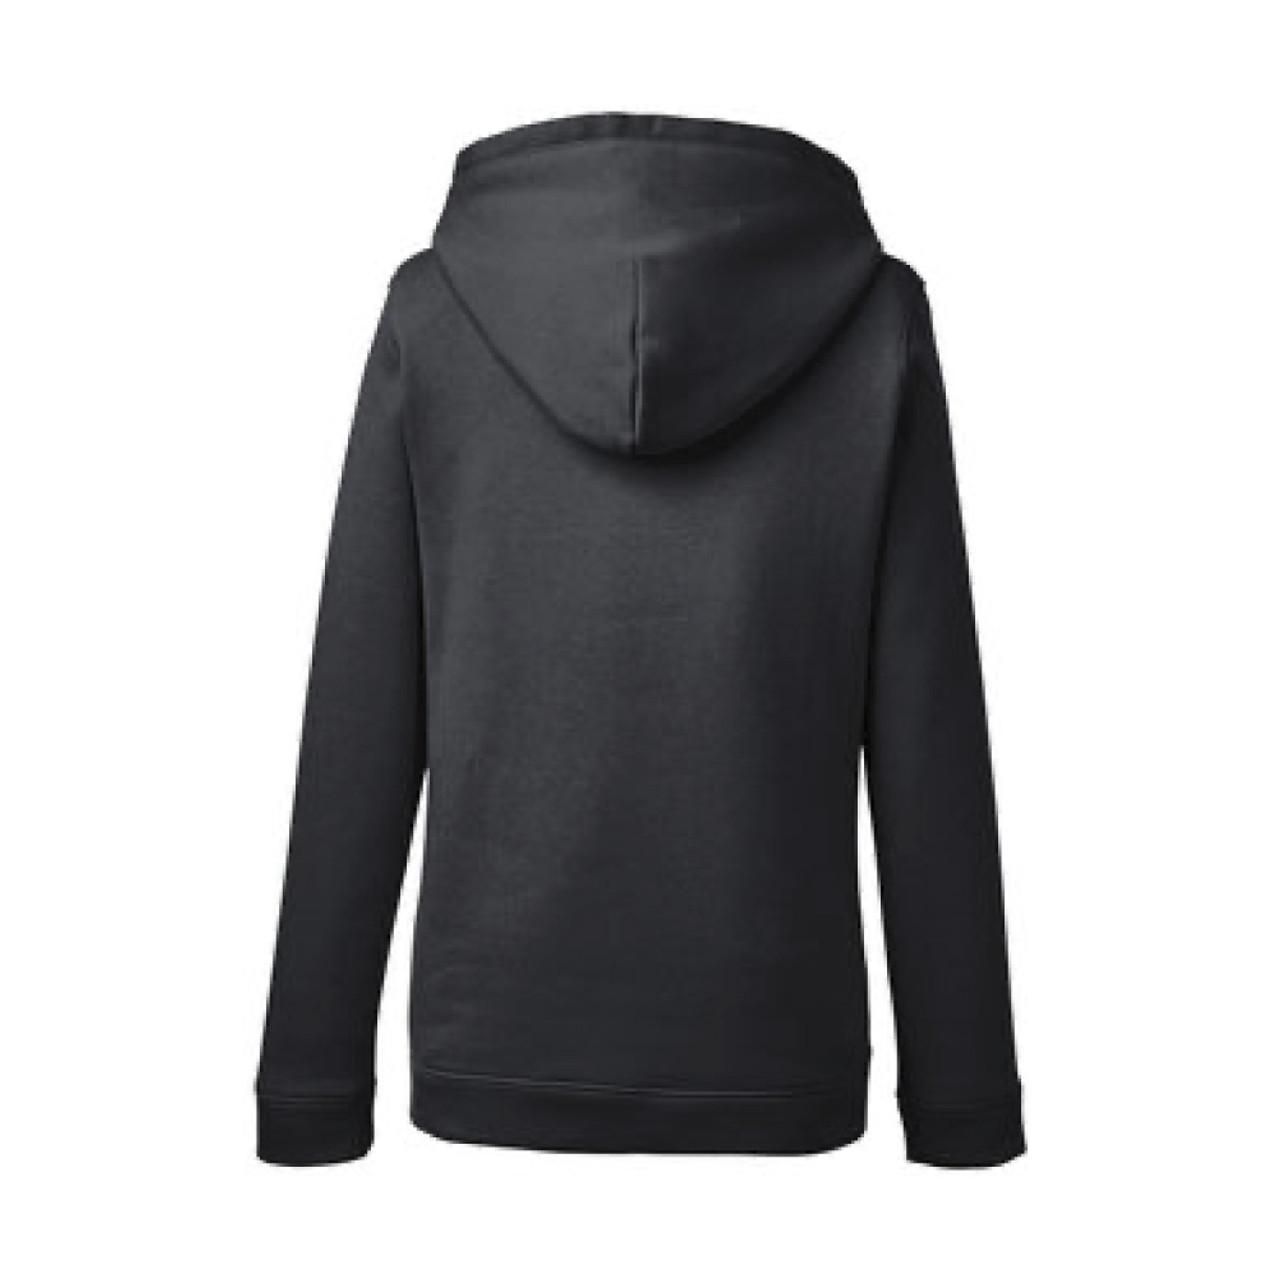 Ladies Under Armour Black Pullover Hood Sweatshirt